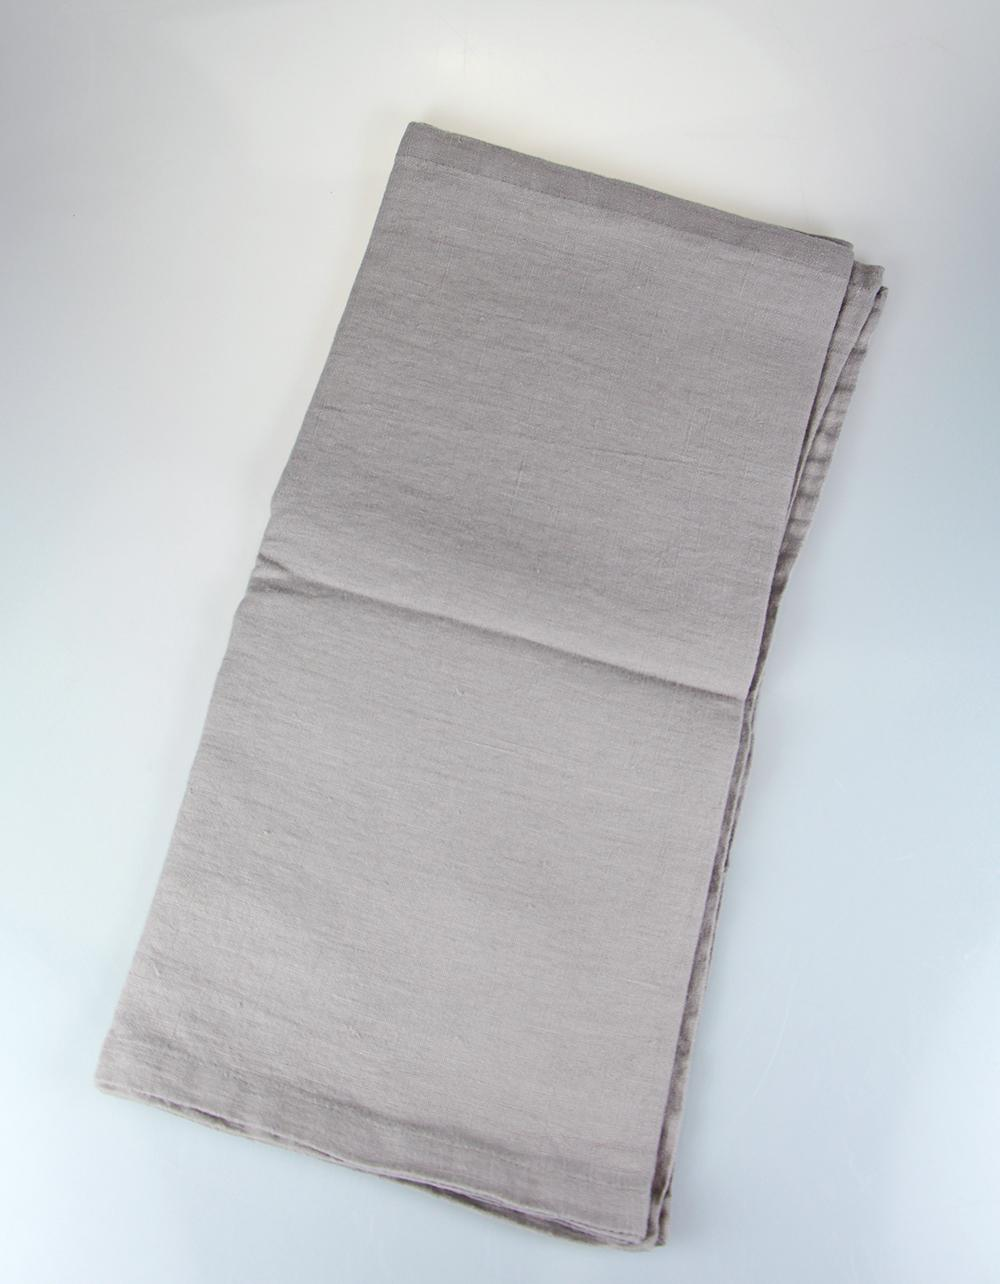 The Essential Ingredient Pure Linen Table Runner - Beige 45cm x 180cm